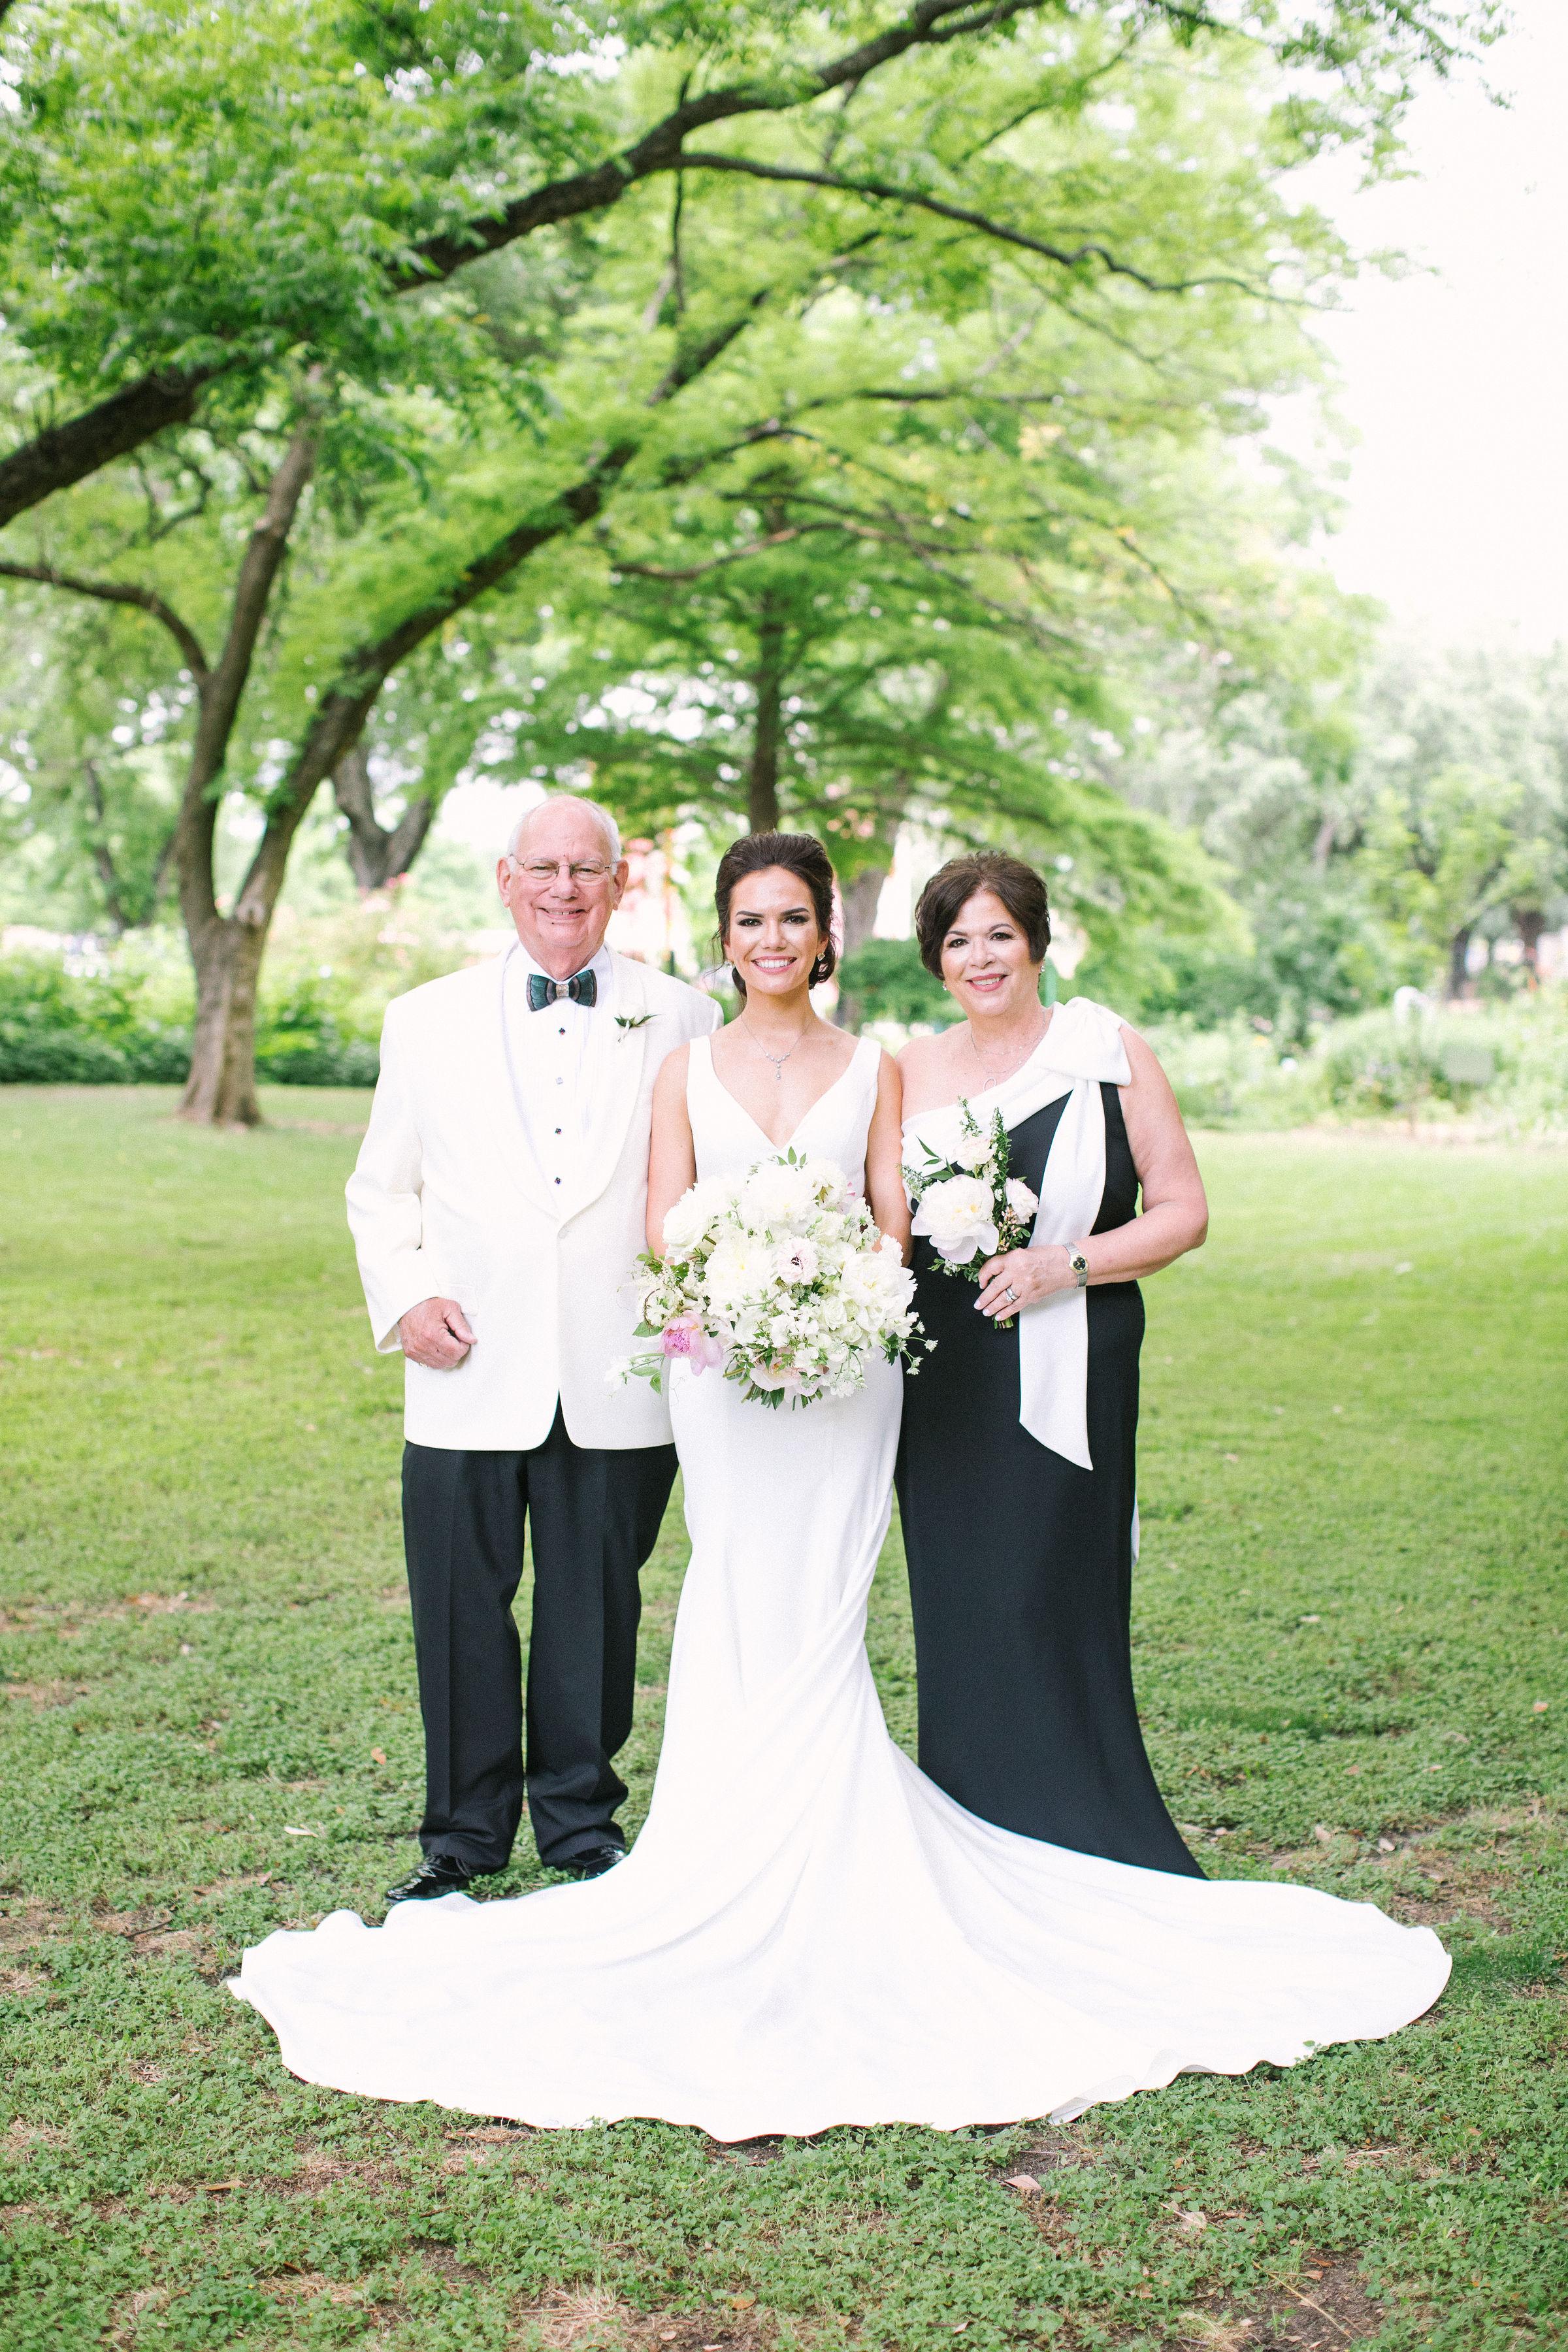 Erin-Parents-Ivory-and-Vine.jpg